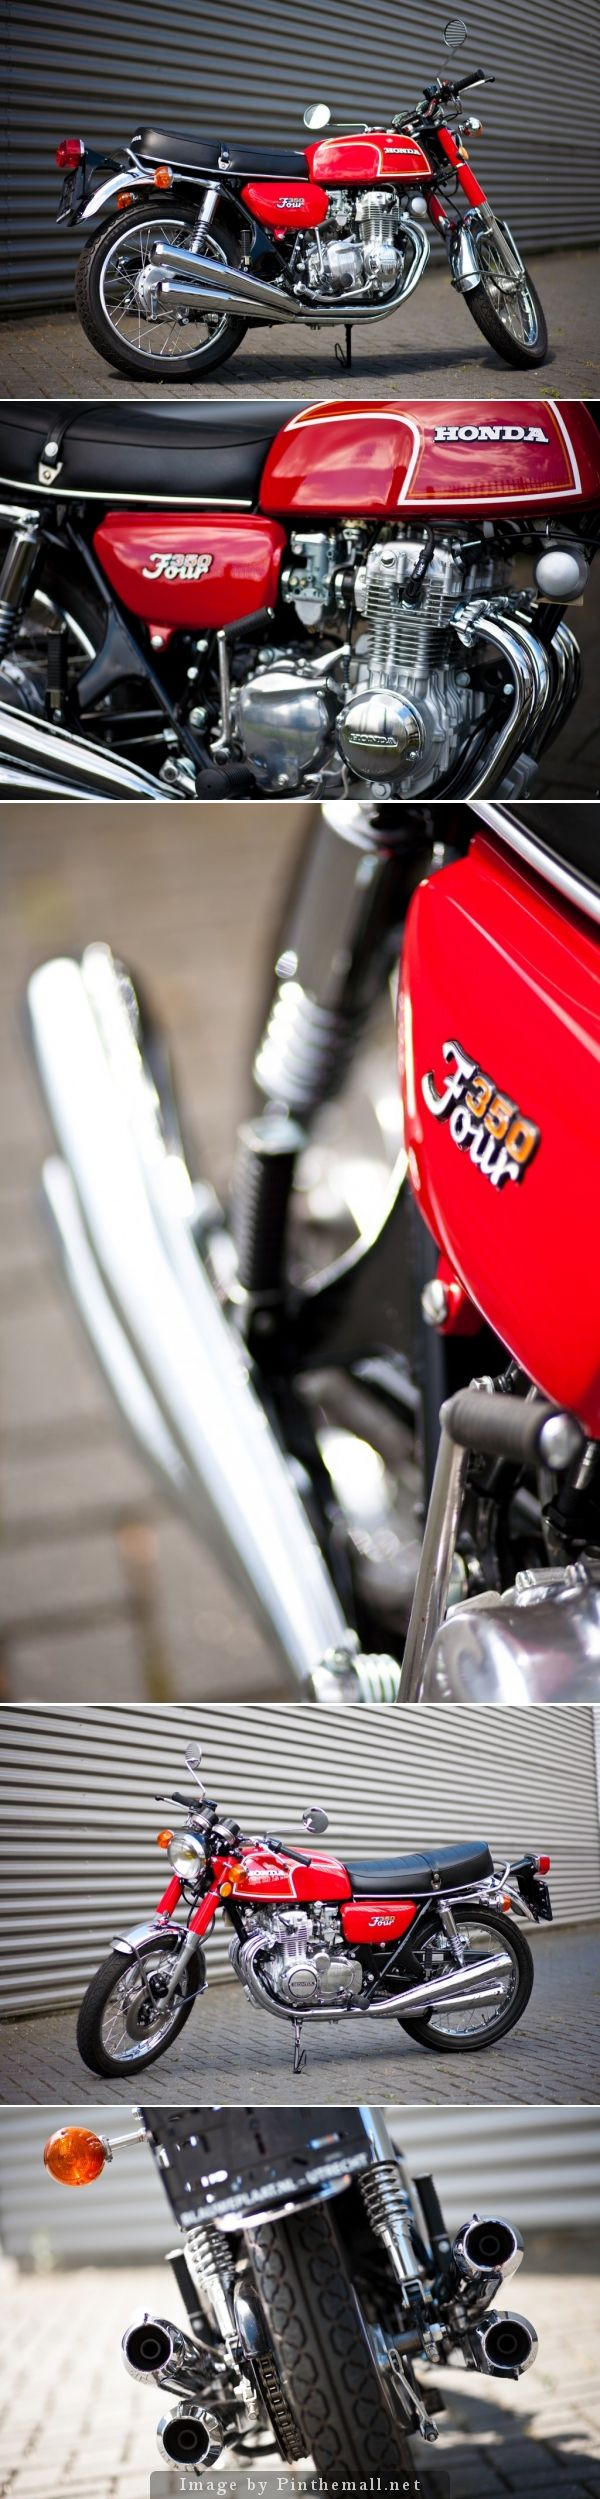 Honda CB350 Four. Restored by 'Blauwe Plaat' Utrecht, the Netherlands. Photography by Thomas Reedijk.